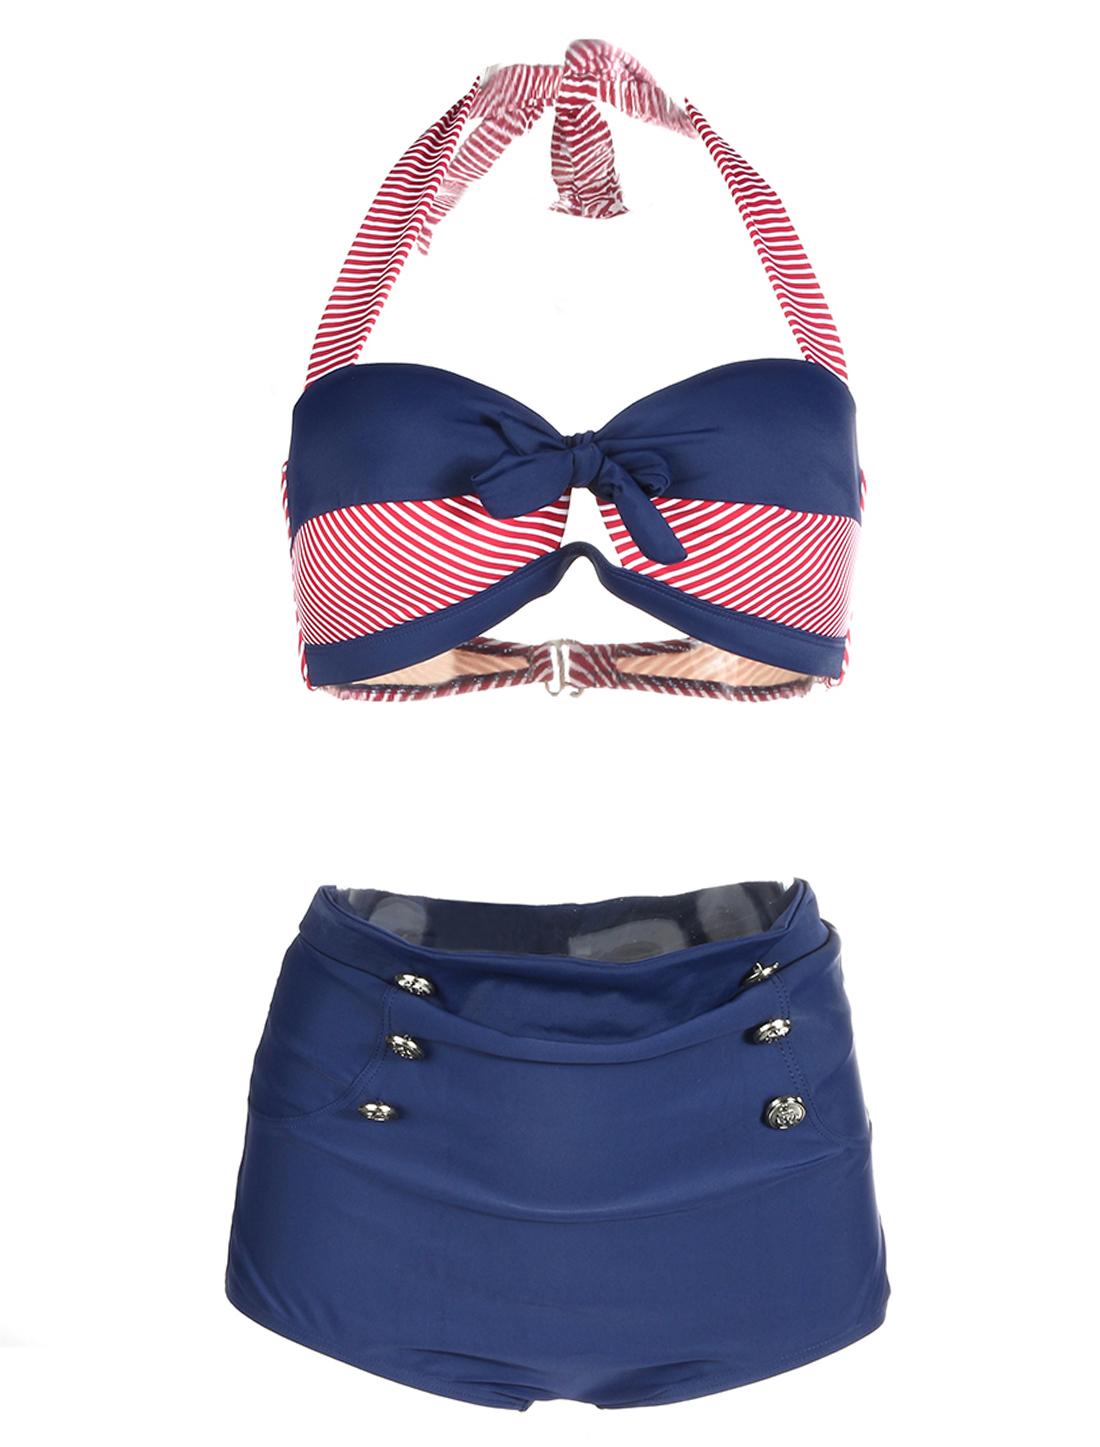 Women High Waist Bikini Navy Stripes Swimsuit Halter Retro Bathing Suit Buttons Swimwear US12